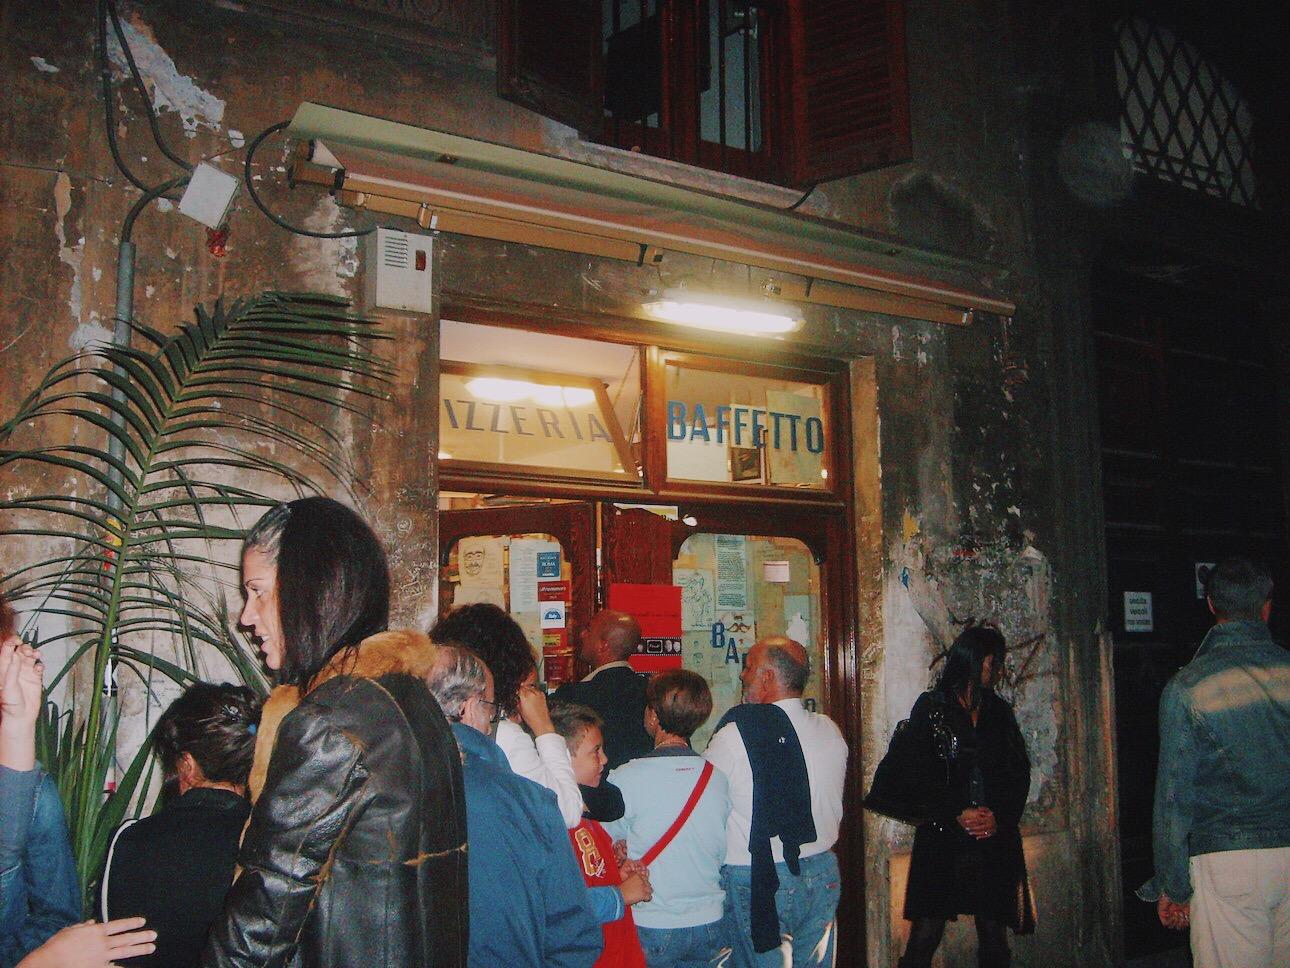 Pizzeria Baffetto